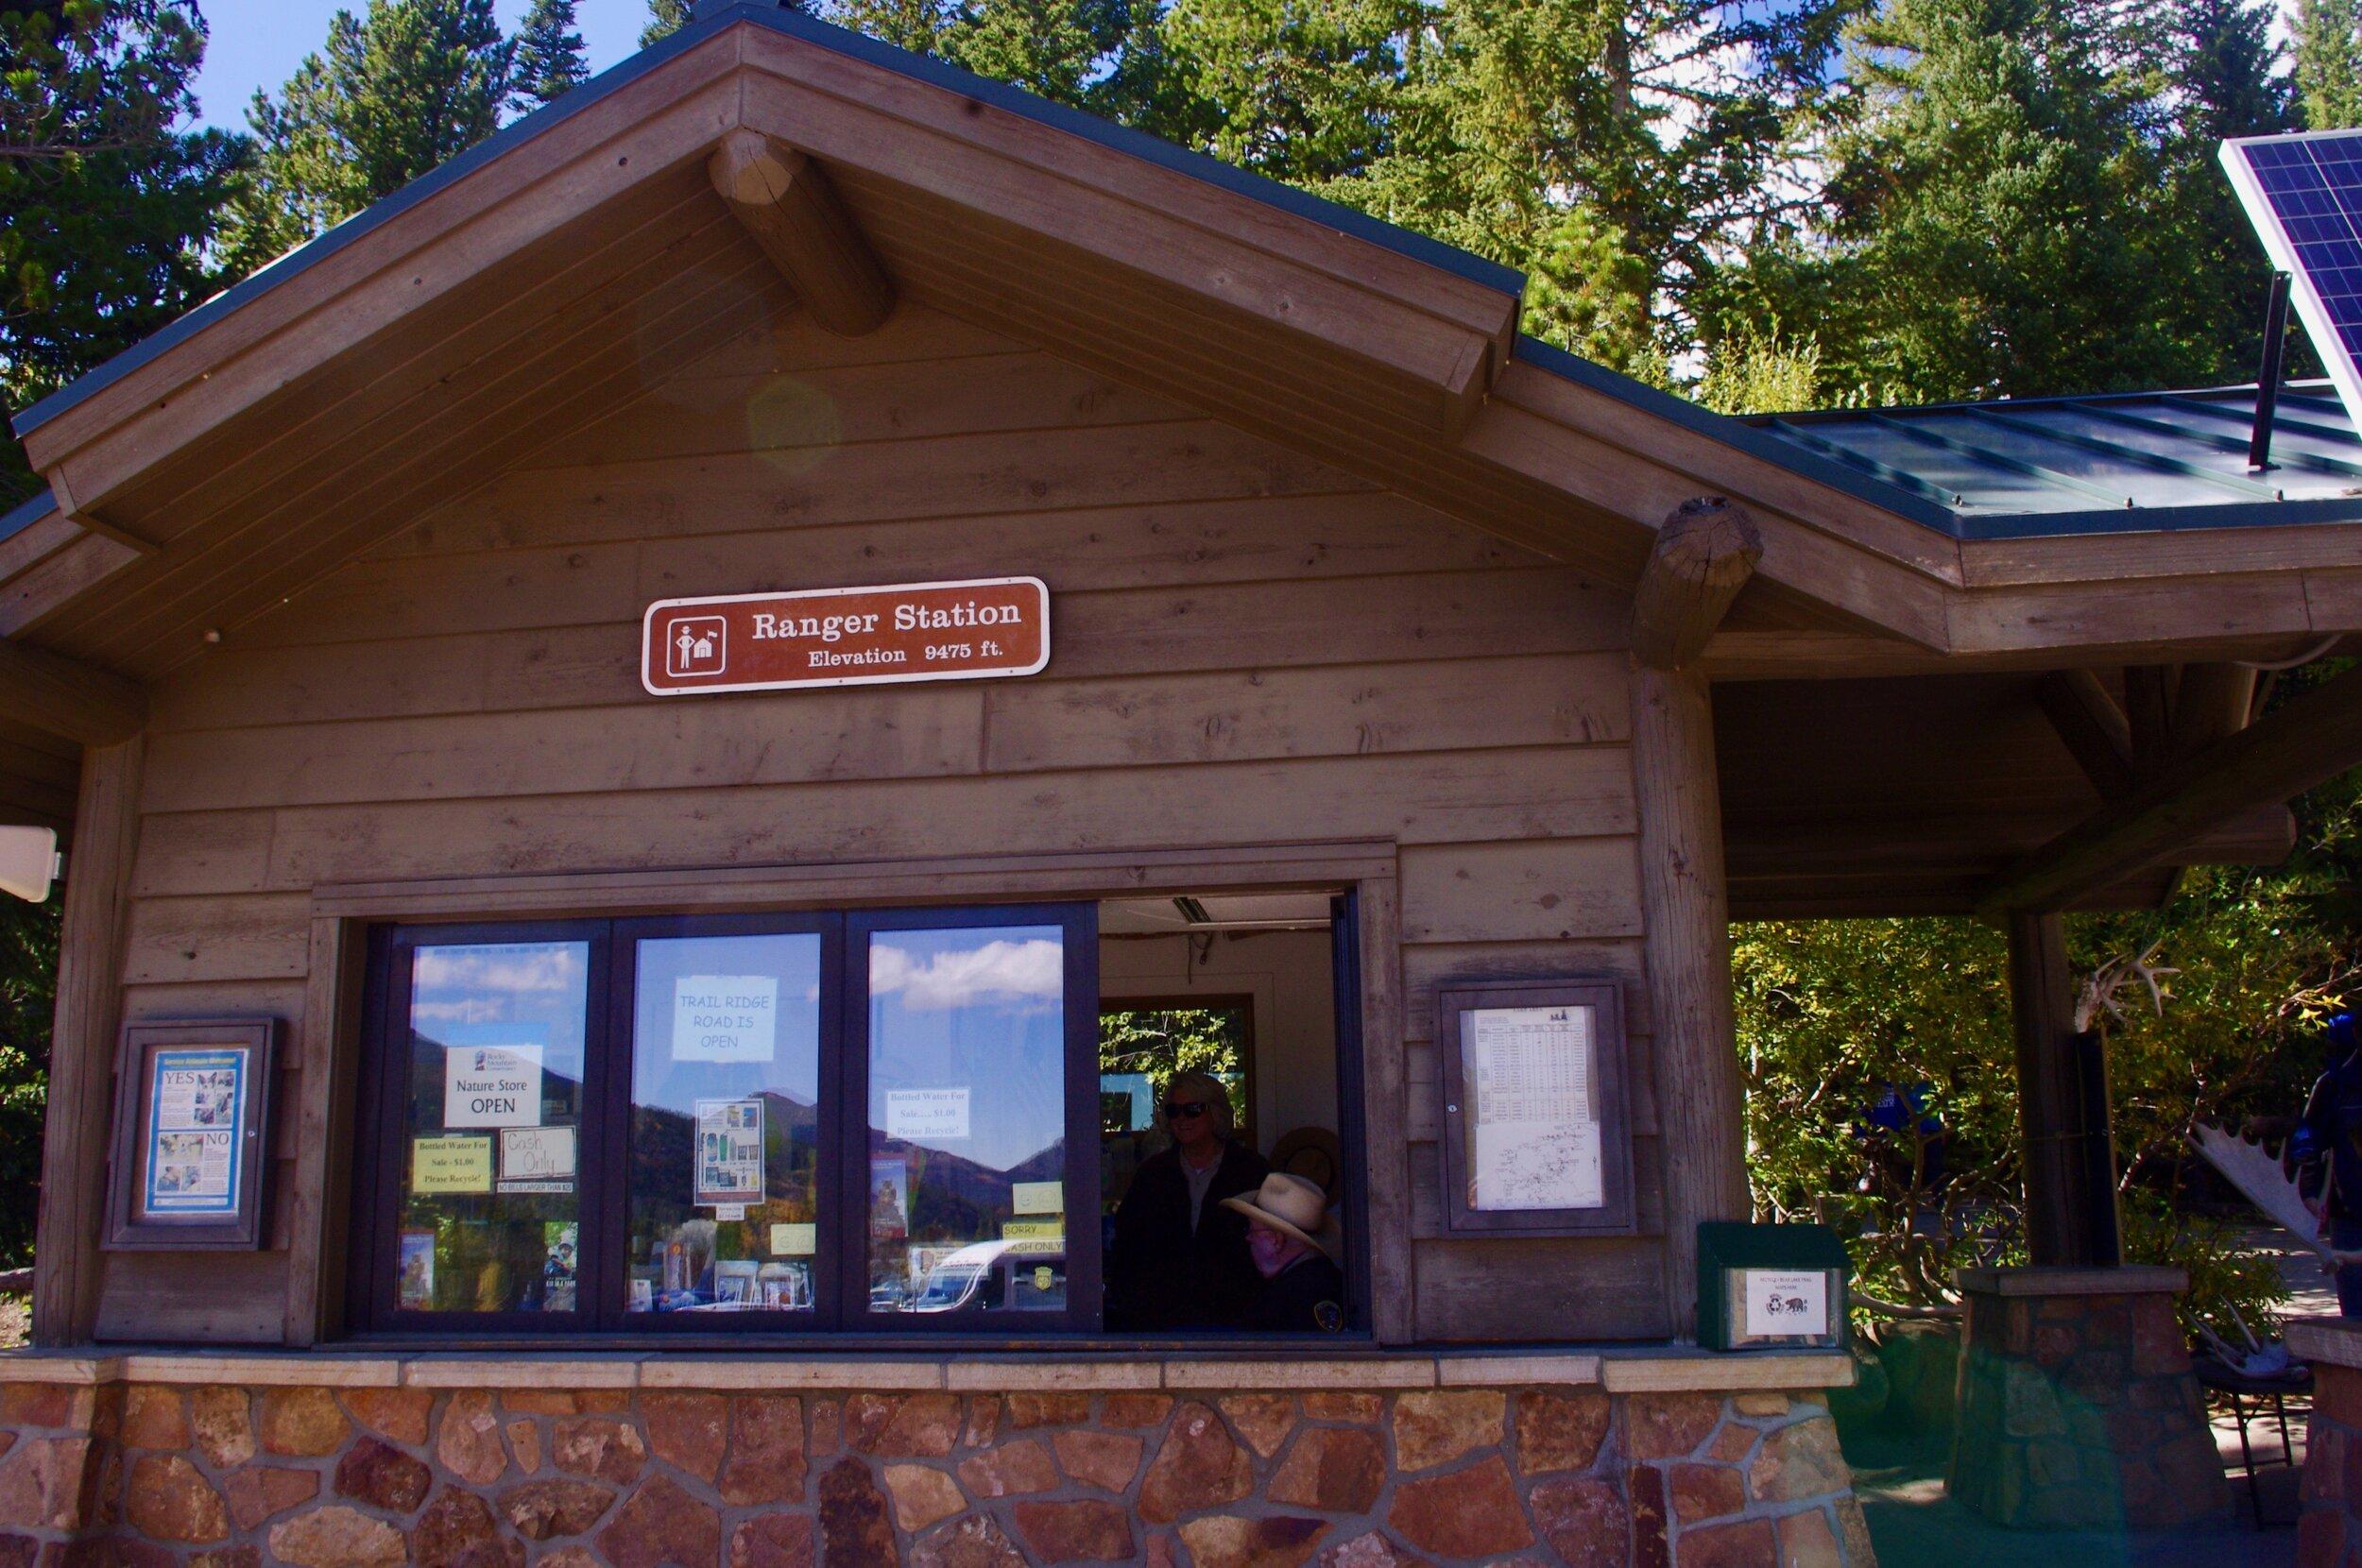 Bear Lake elevation 9475 ft.